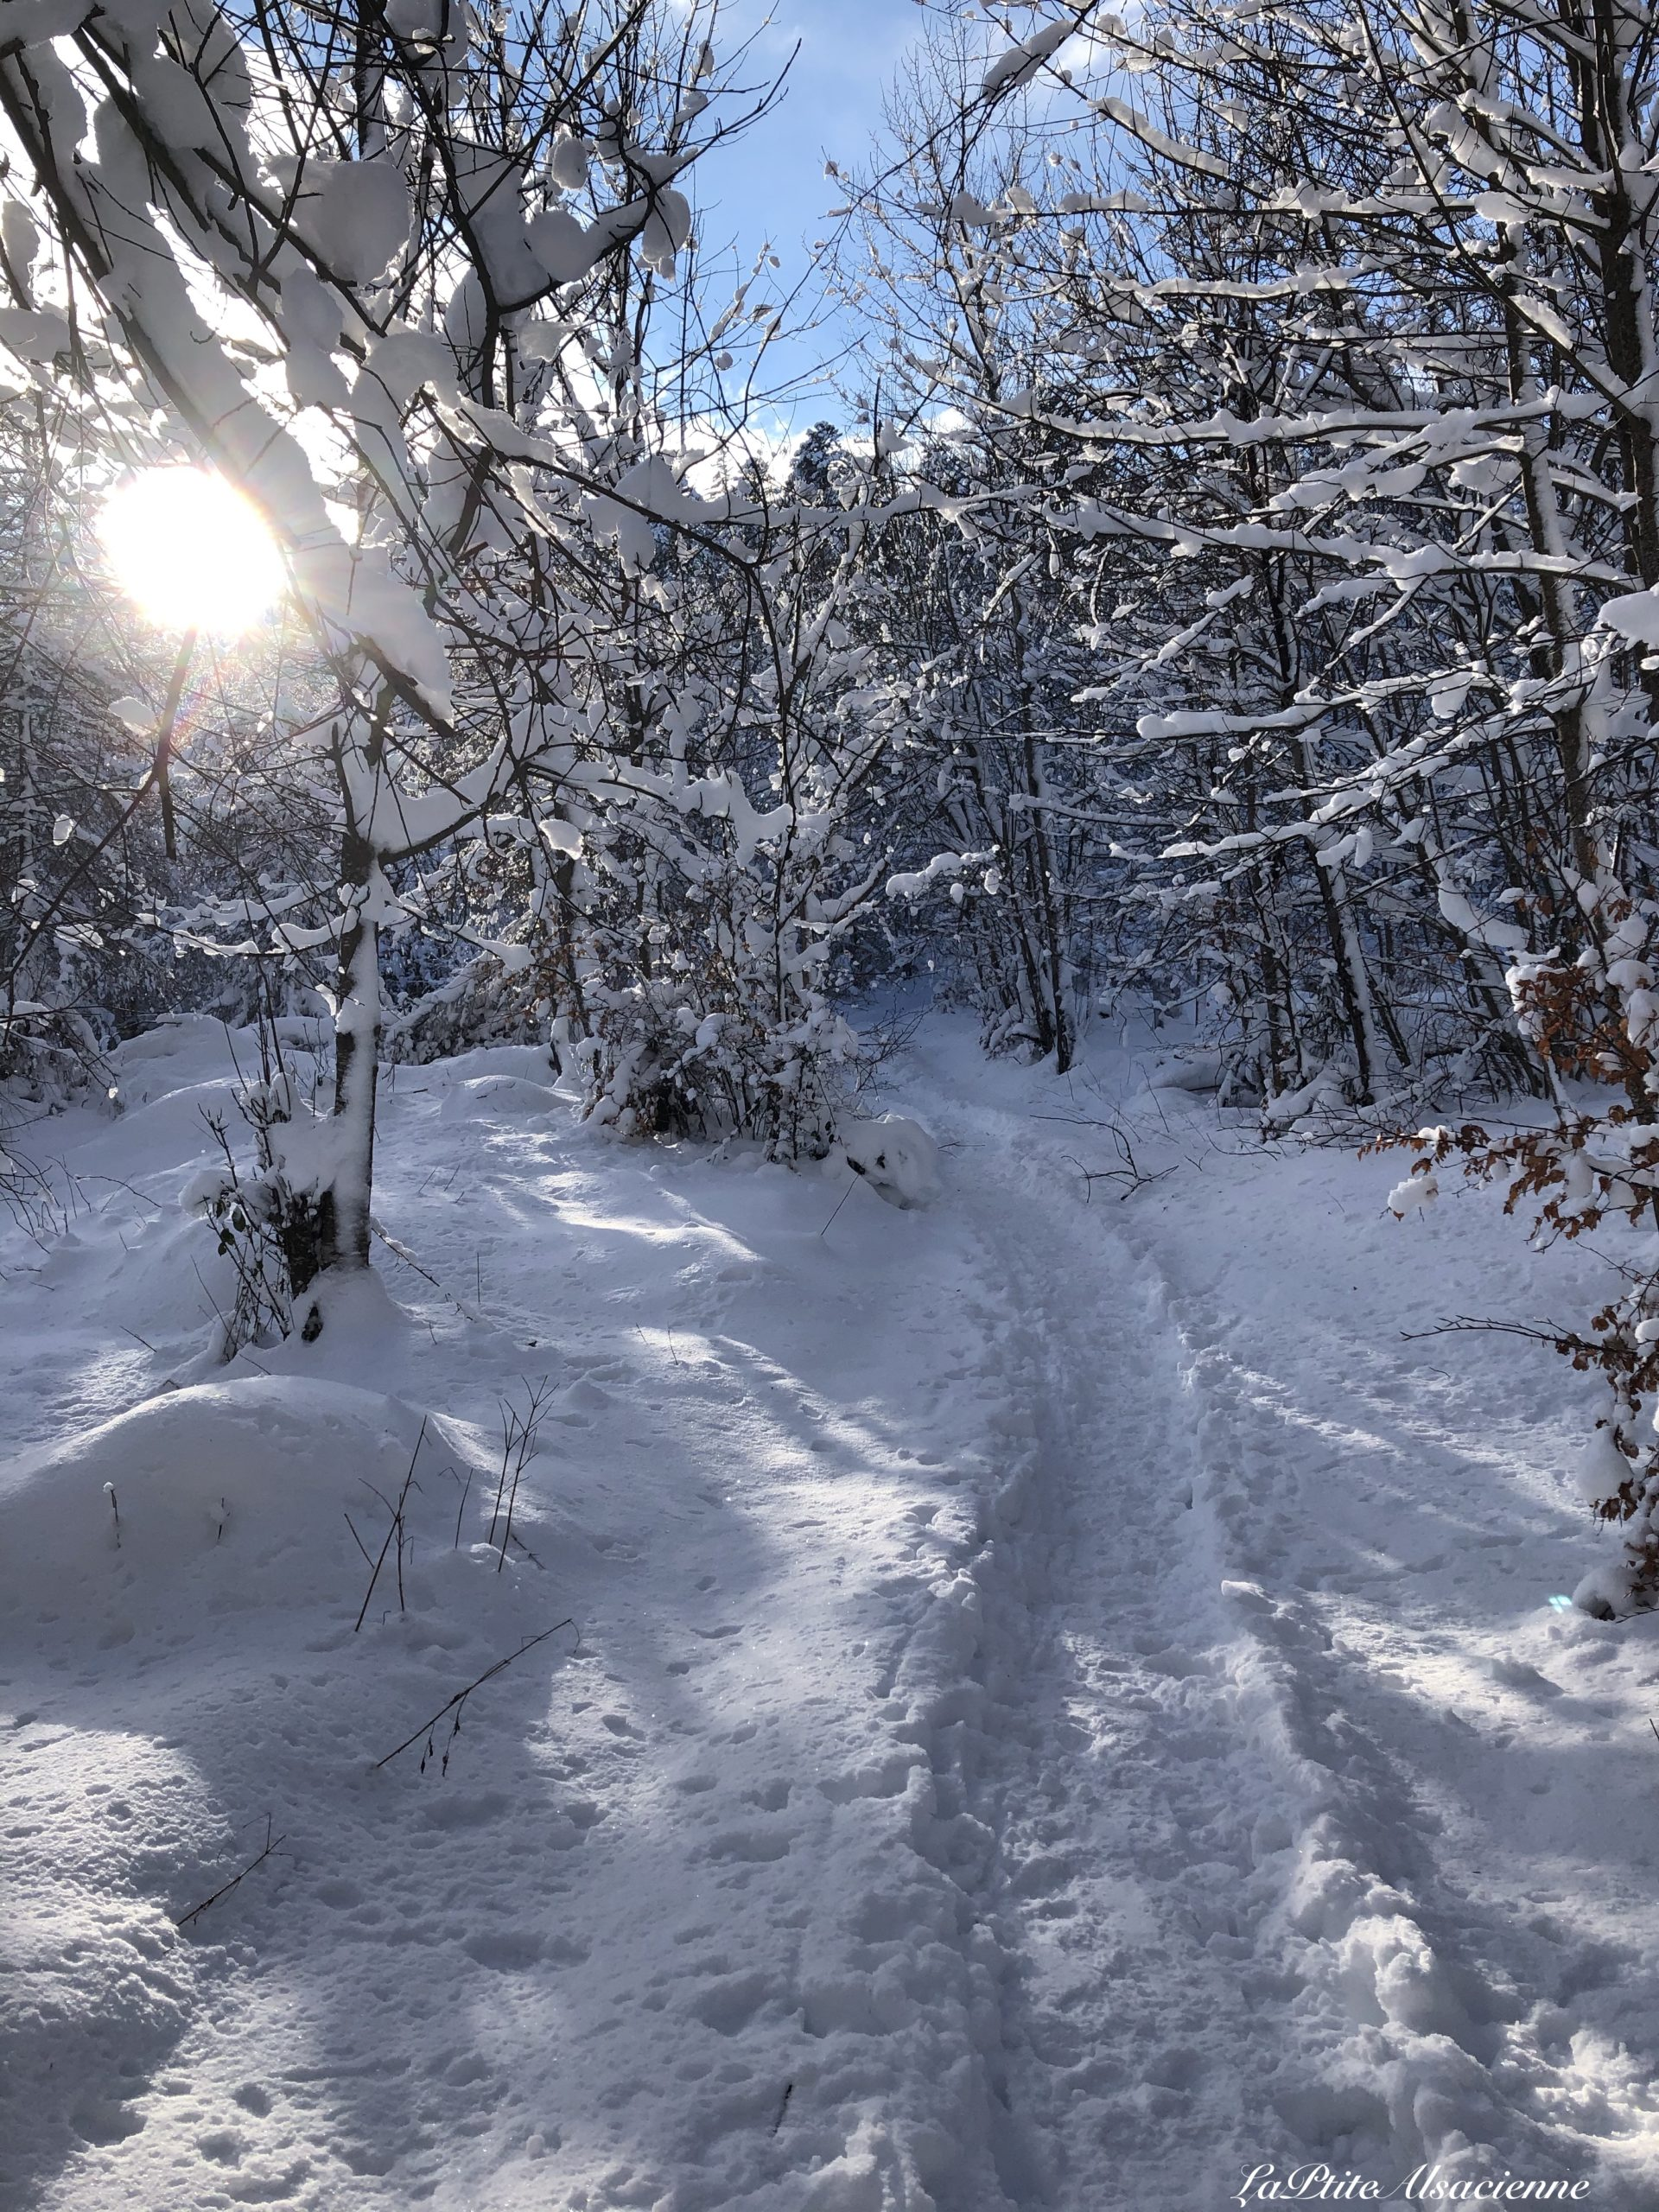 chemin vers le lieserwasen sous la neige